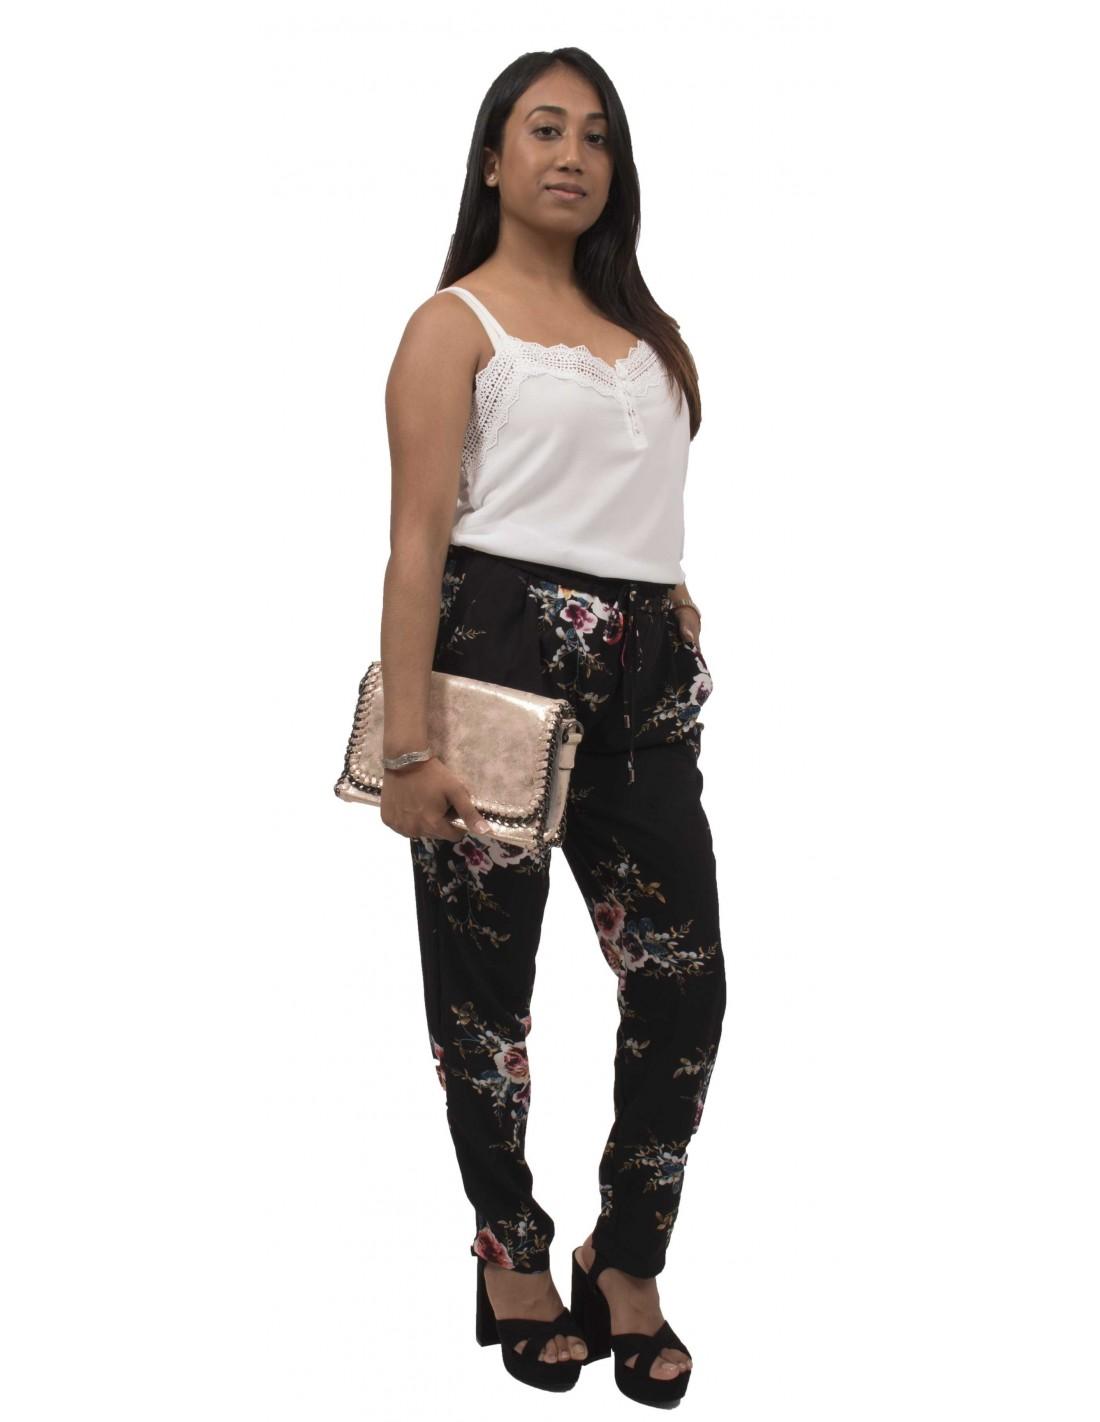 pantalon femme fluide imprim fleurs noir ou bleu marine ample. Black Bedroom Furniture Sets. Home Design Ideas